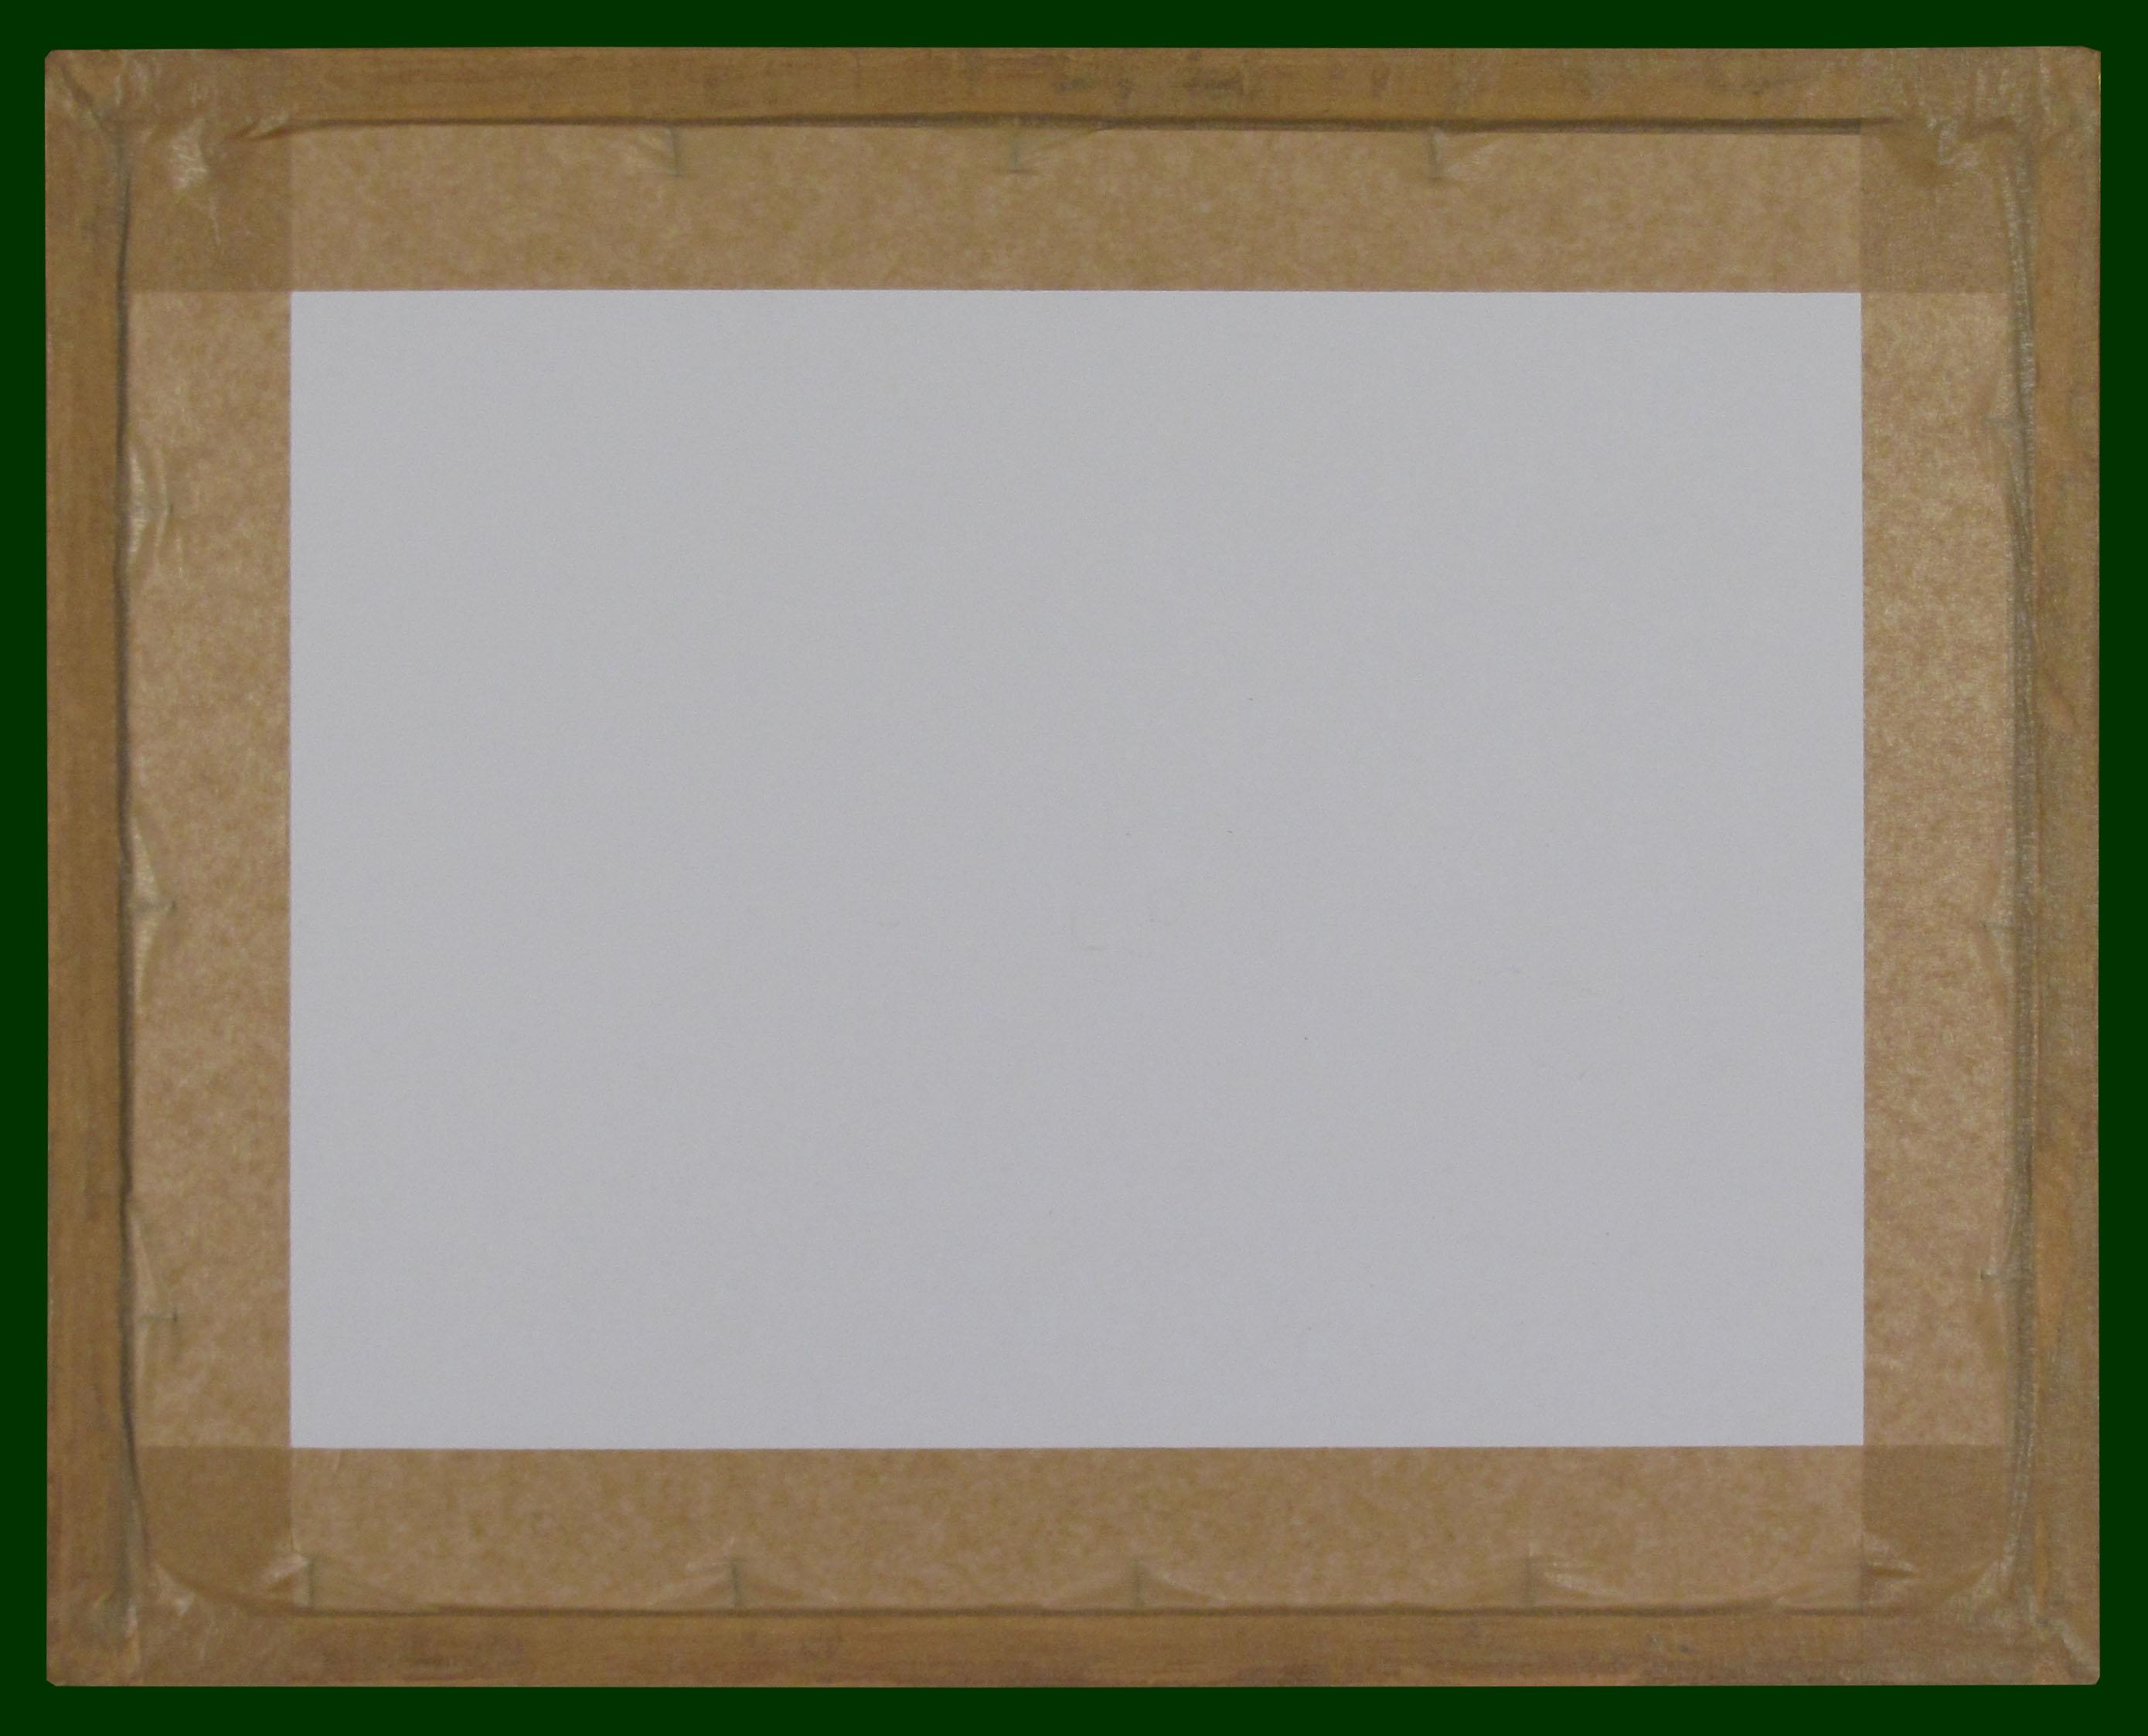 95-14 hát.jpg (2779×2246)